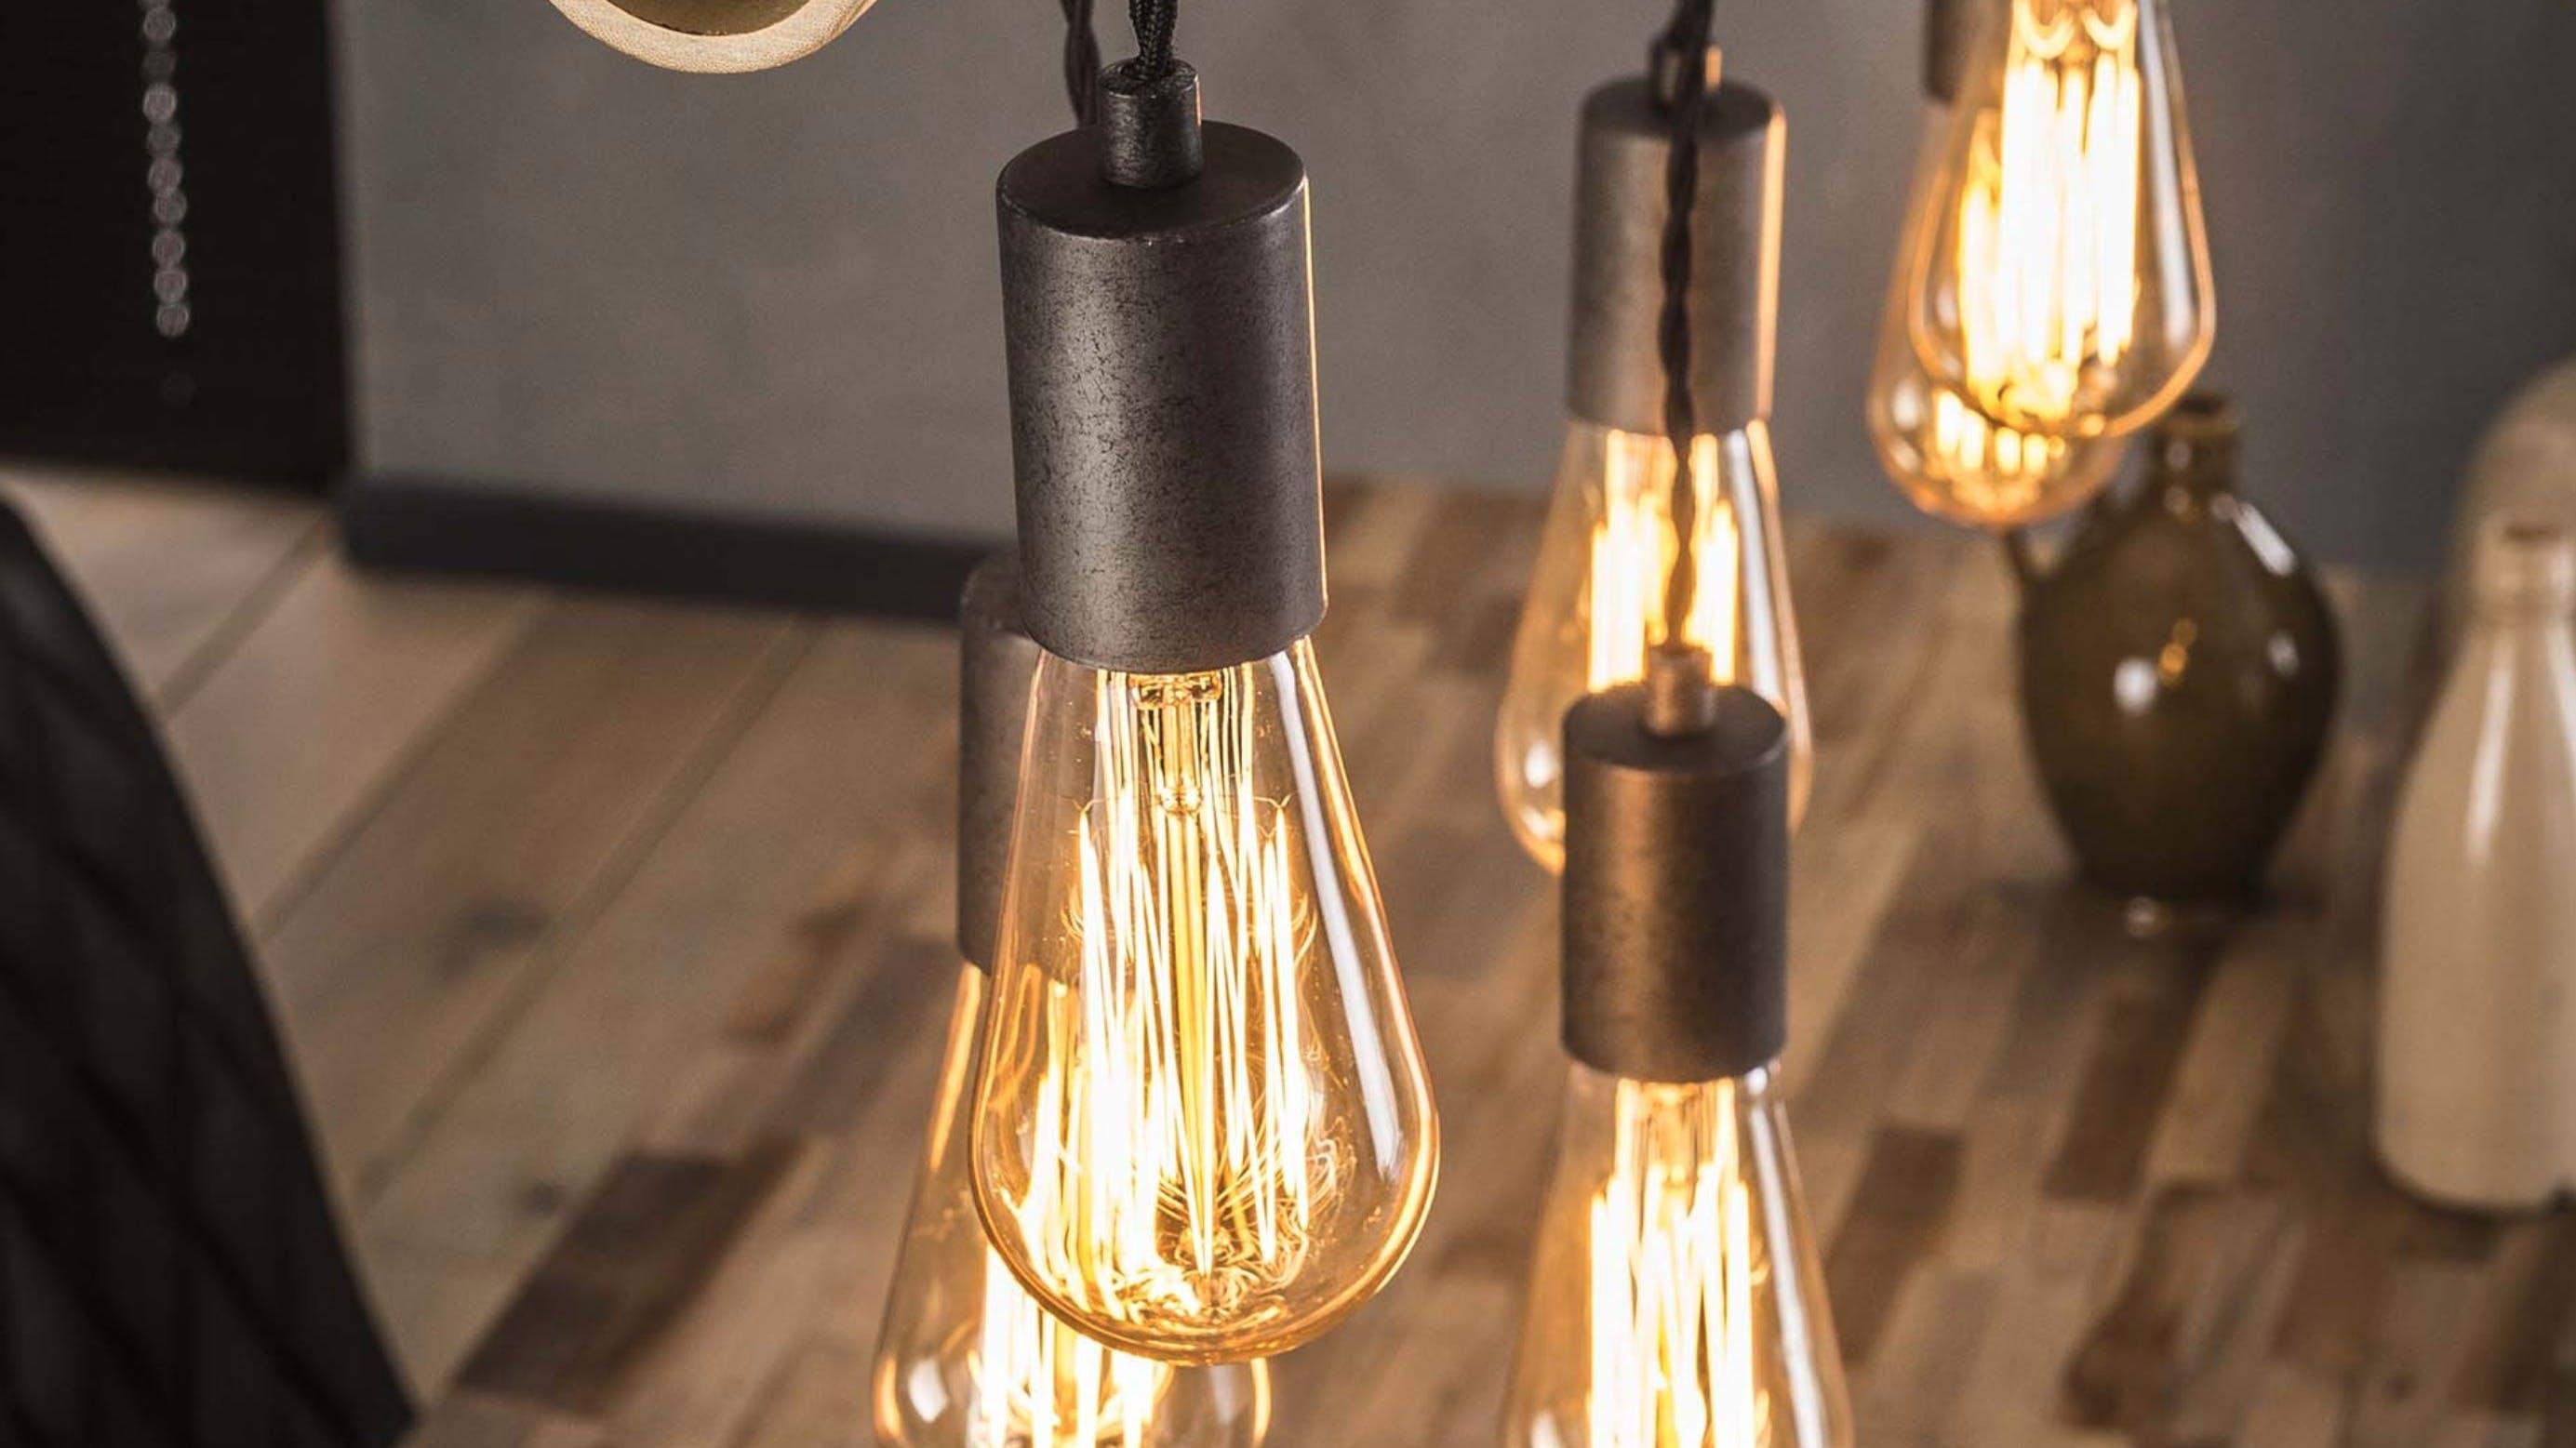 Lampe Salon Salle À Manger luminaires : lampadaire, suspension| luminaires | pier import